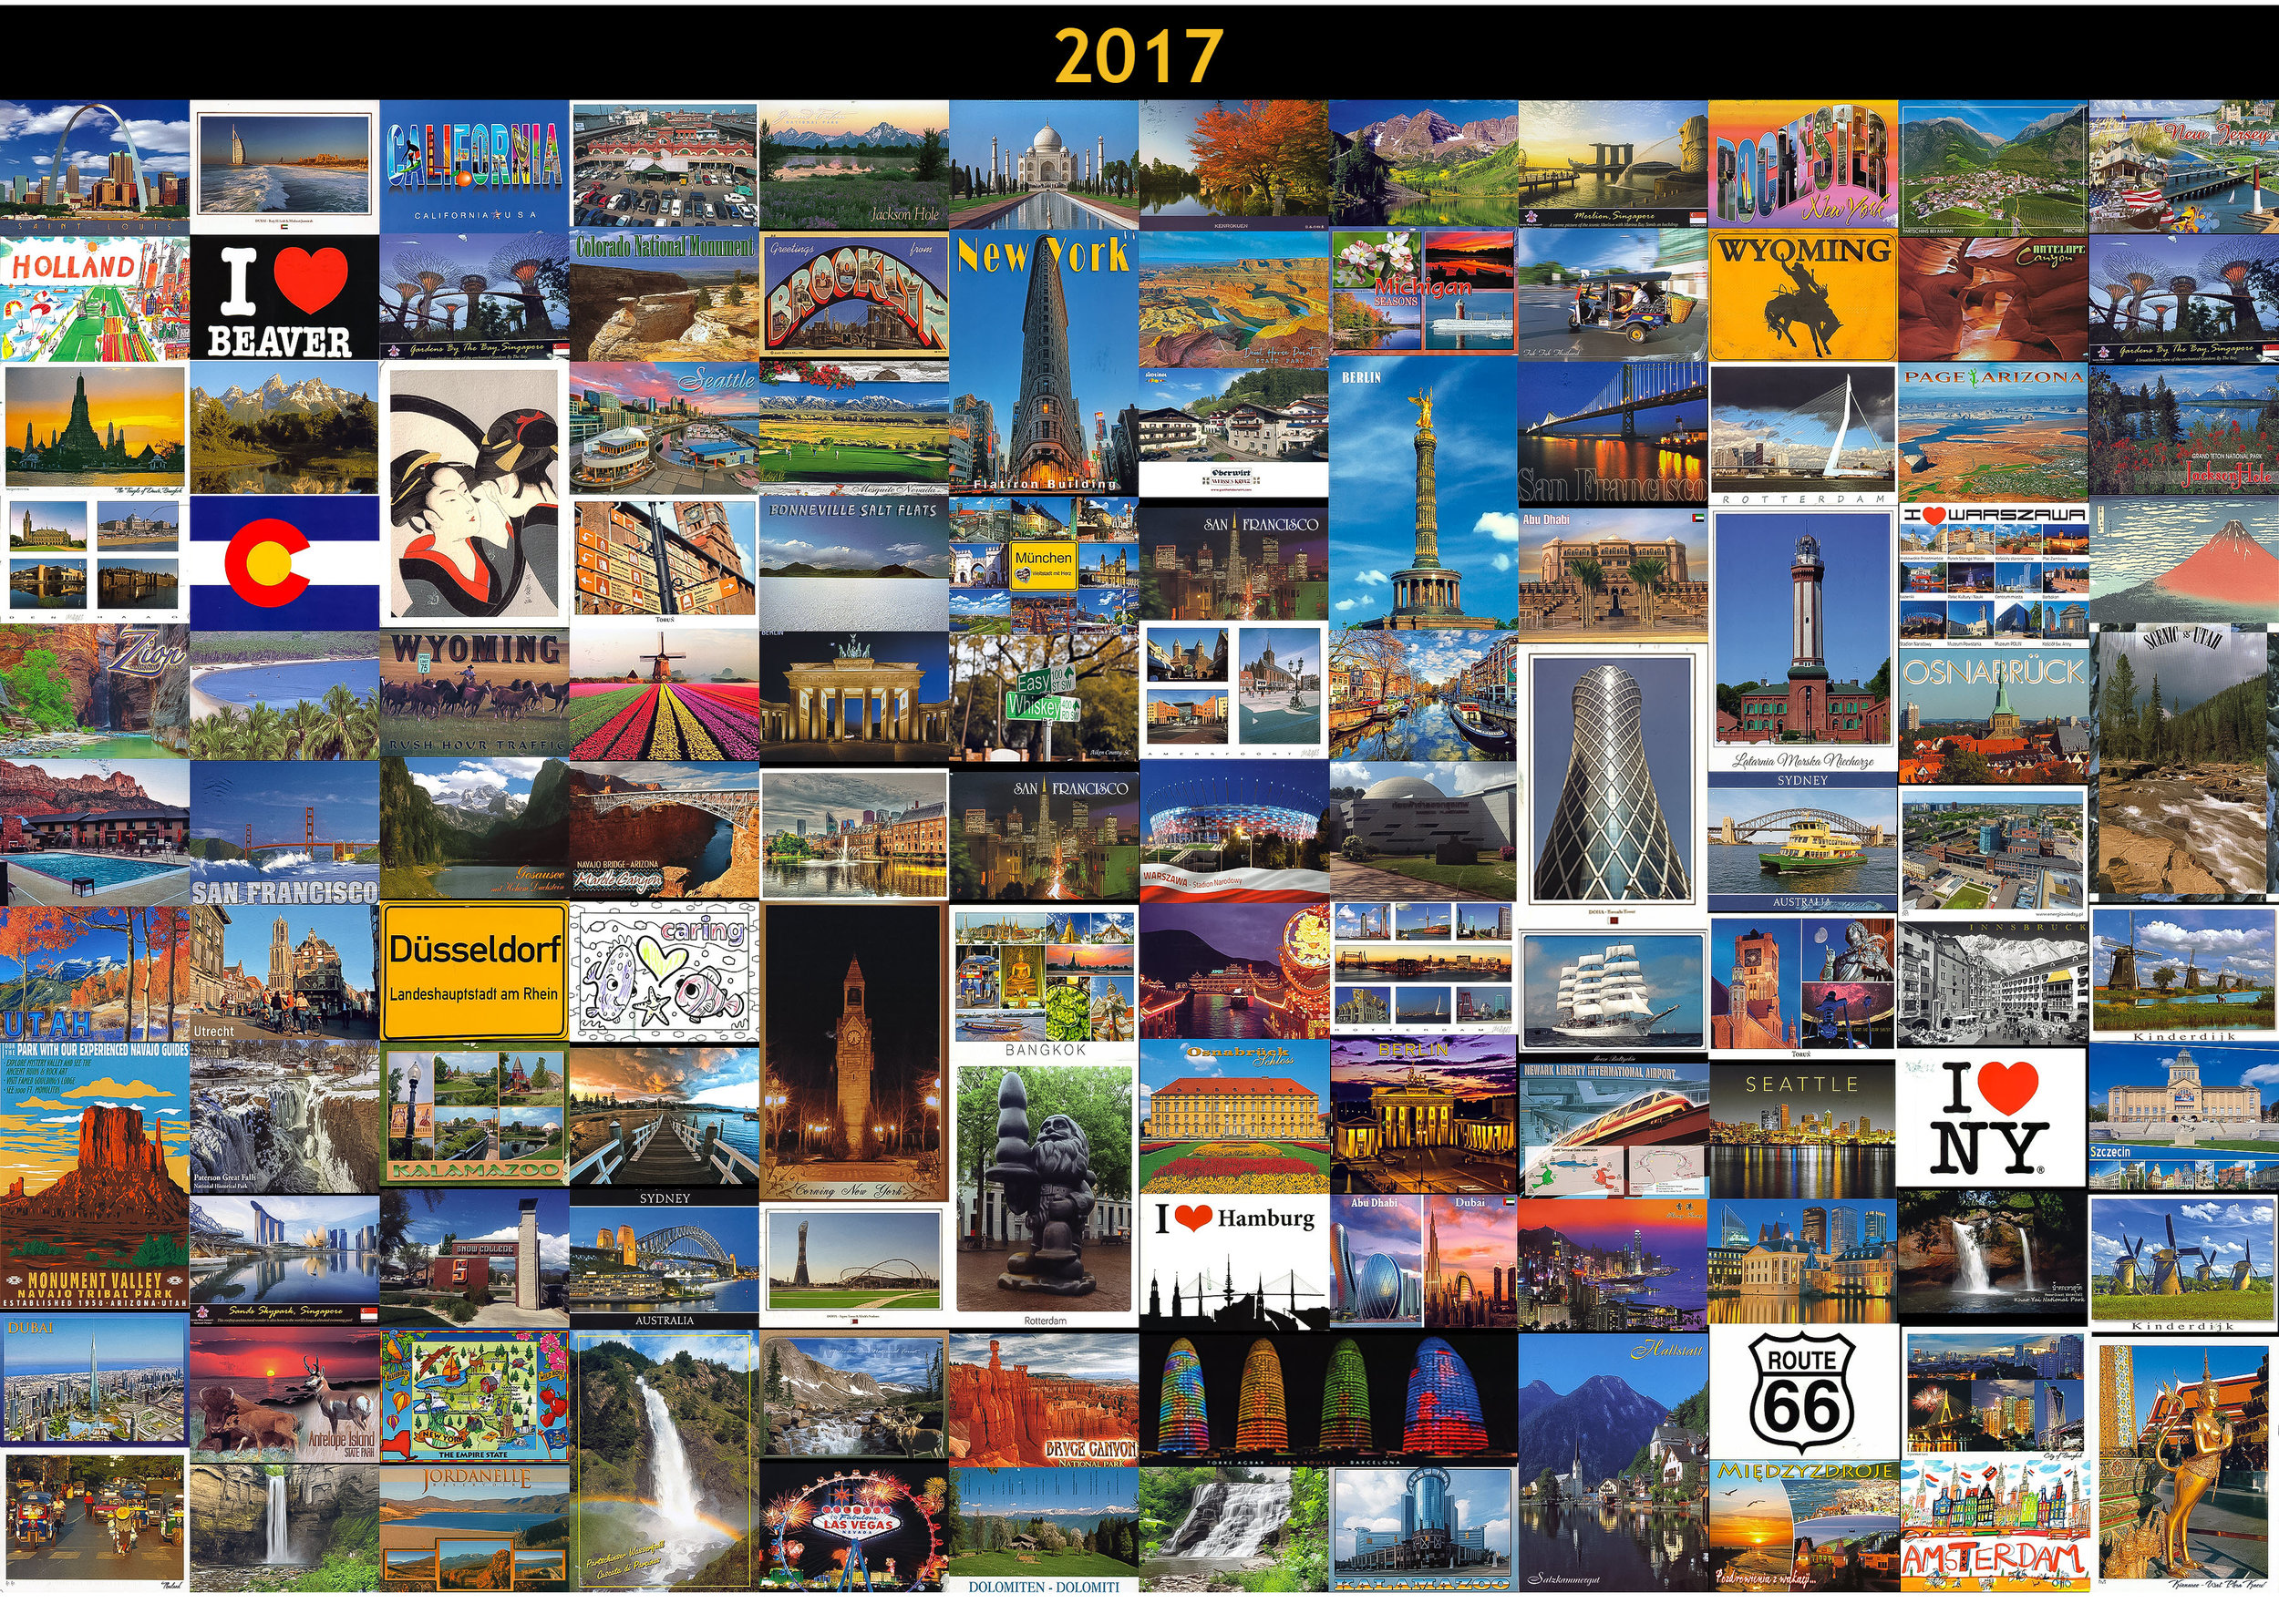 2017 Postcards.jpg